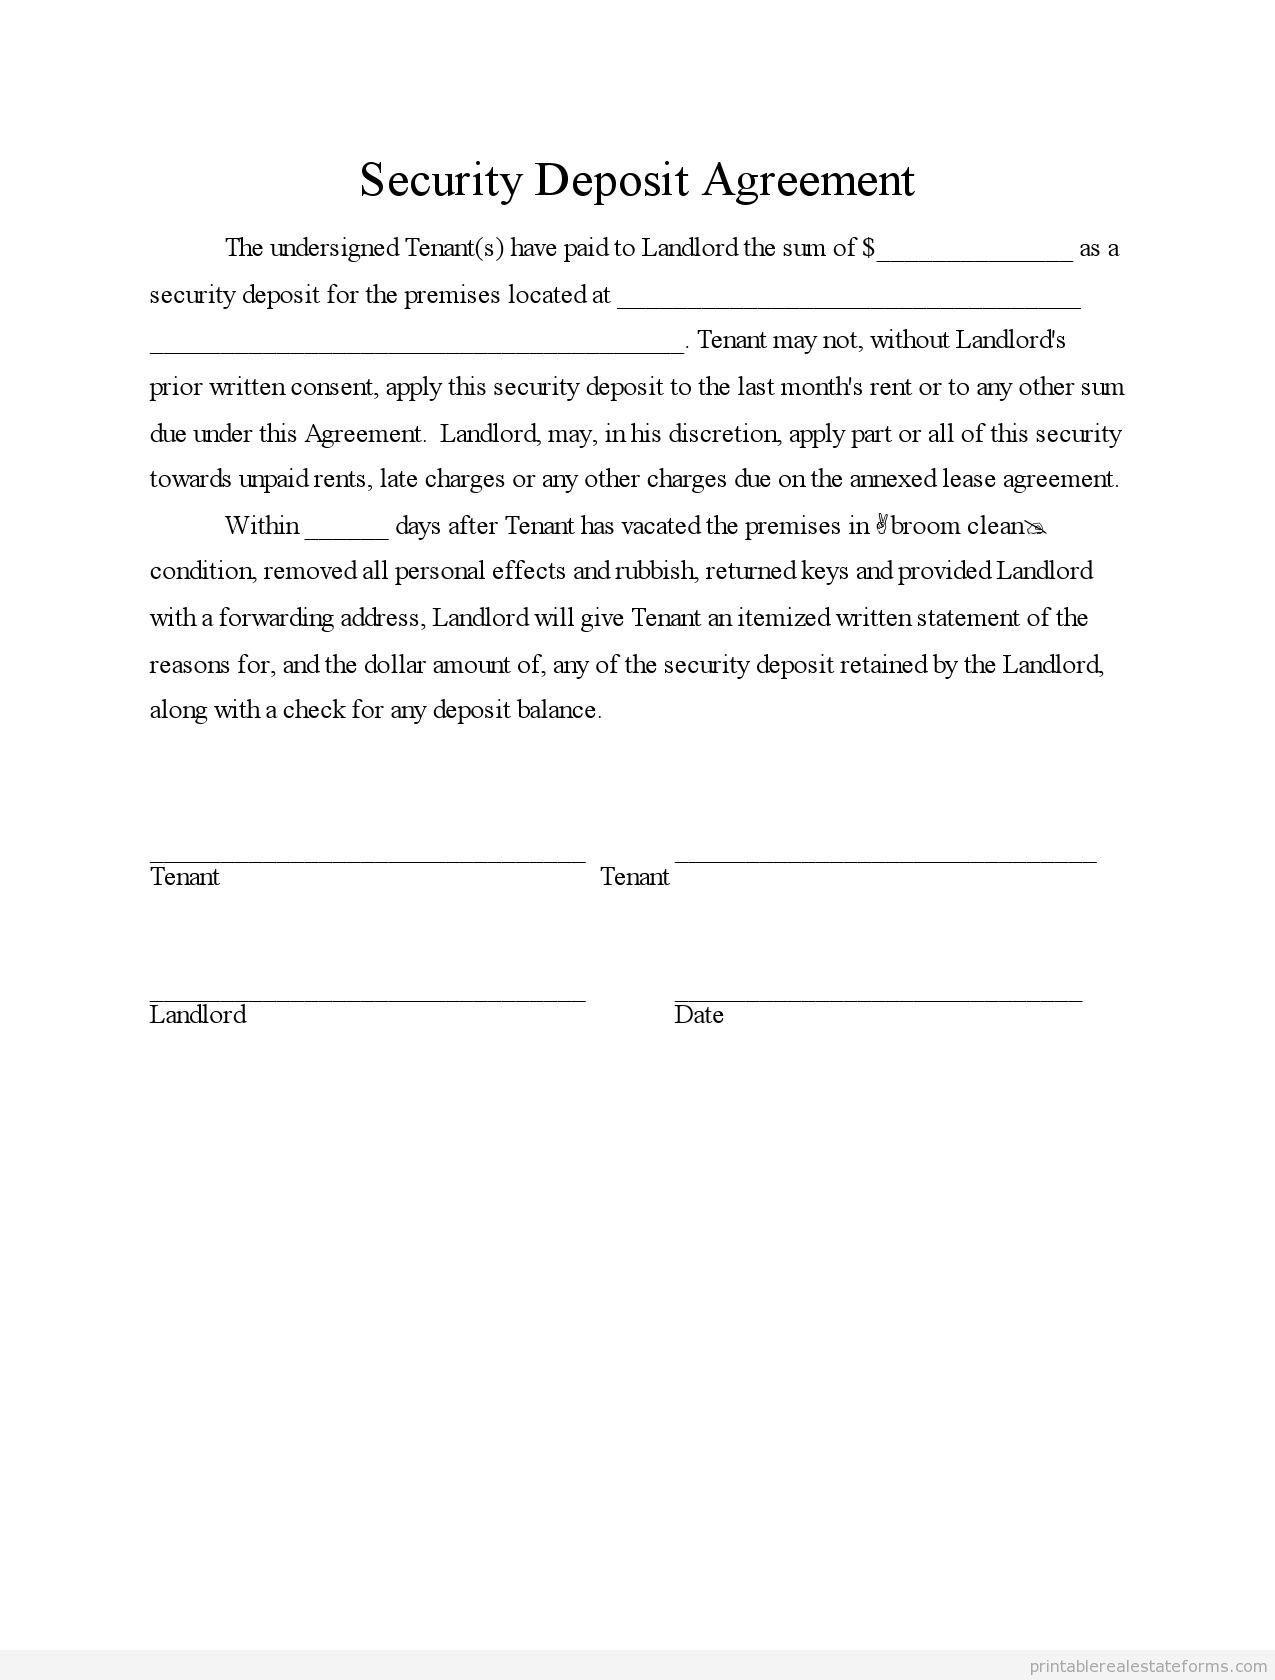 Sample Printable security deposit agreement Form – Rental Deposit Form